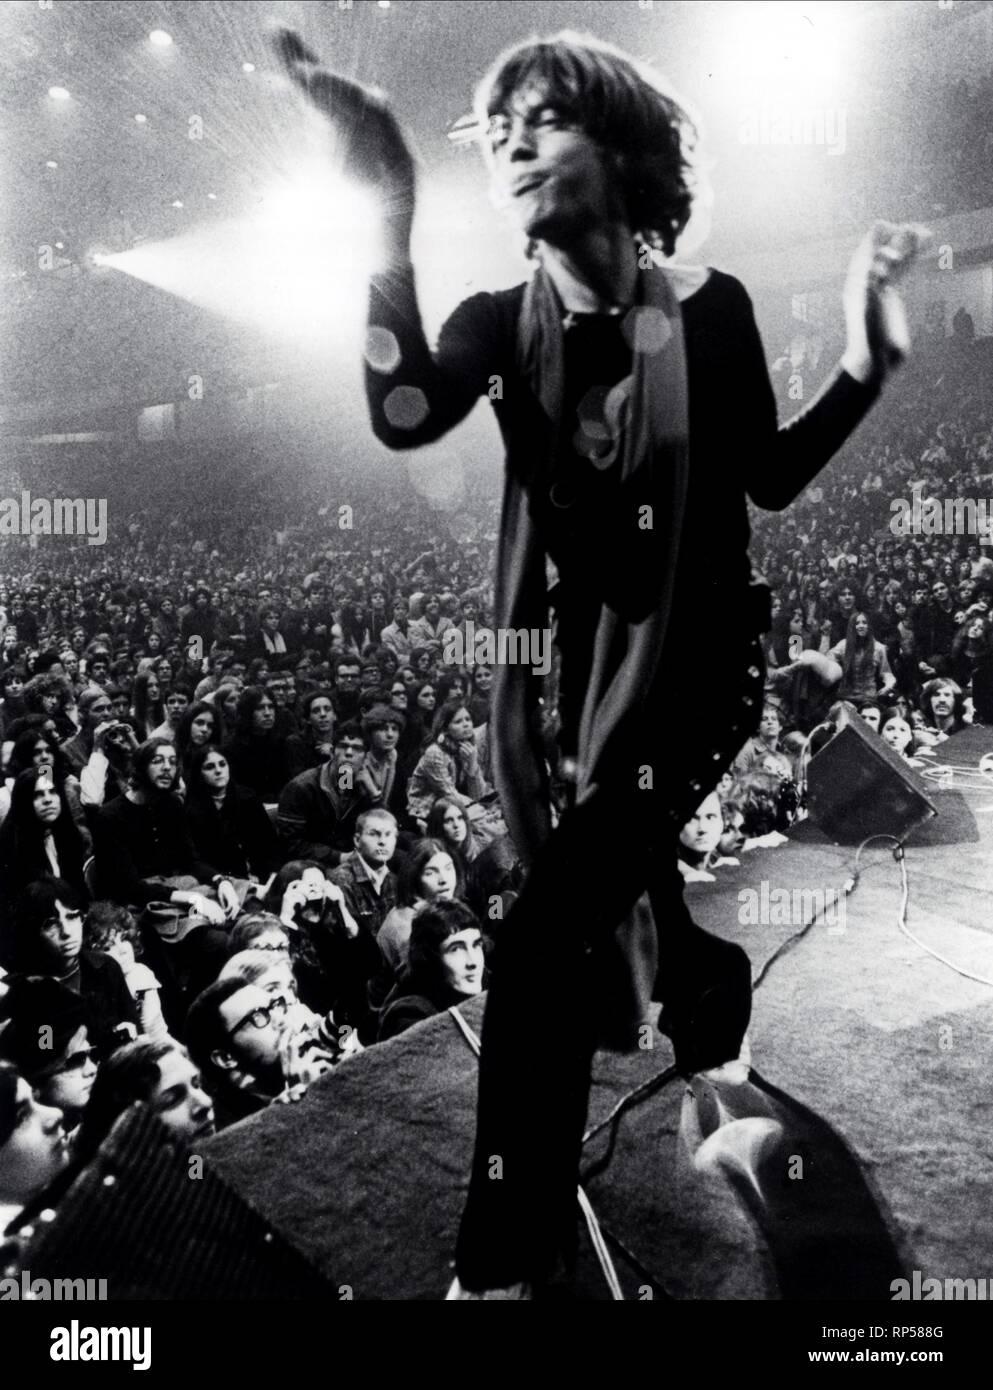 MICK JAGGER, GIMME SHELTER, 1970 - Stock Image